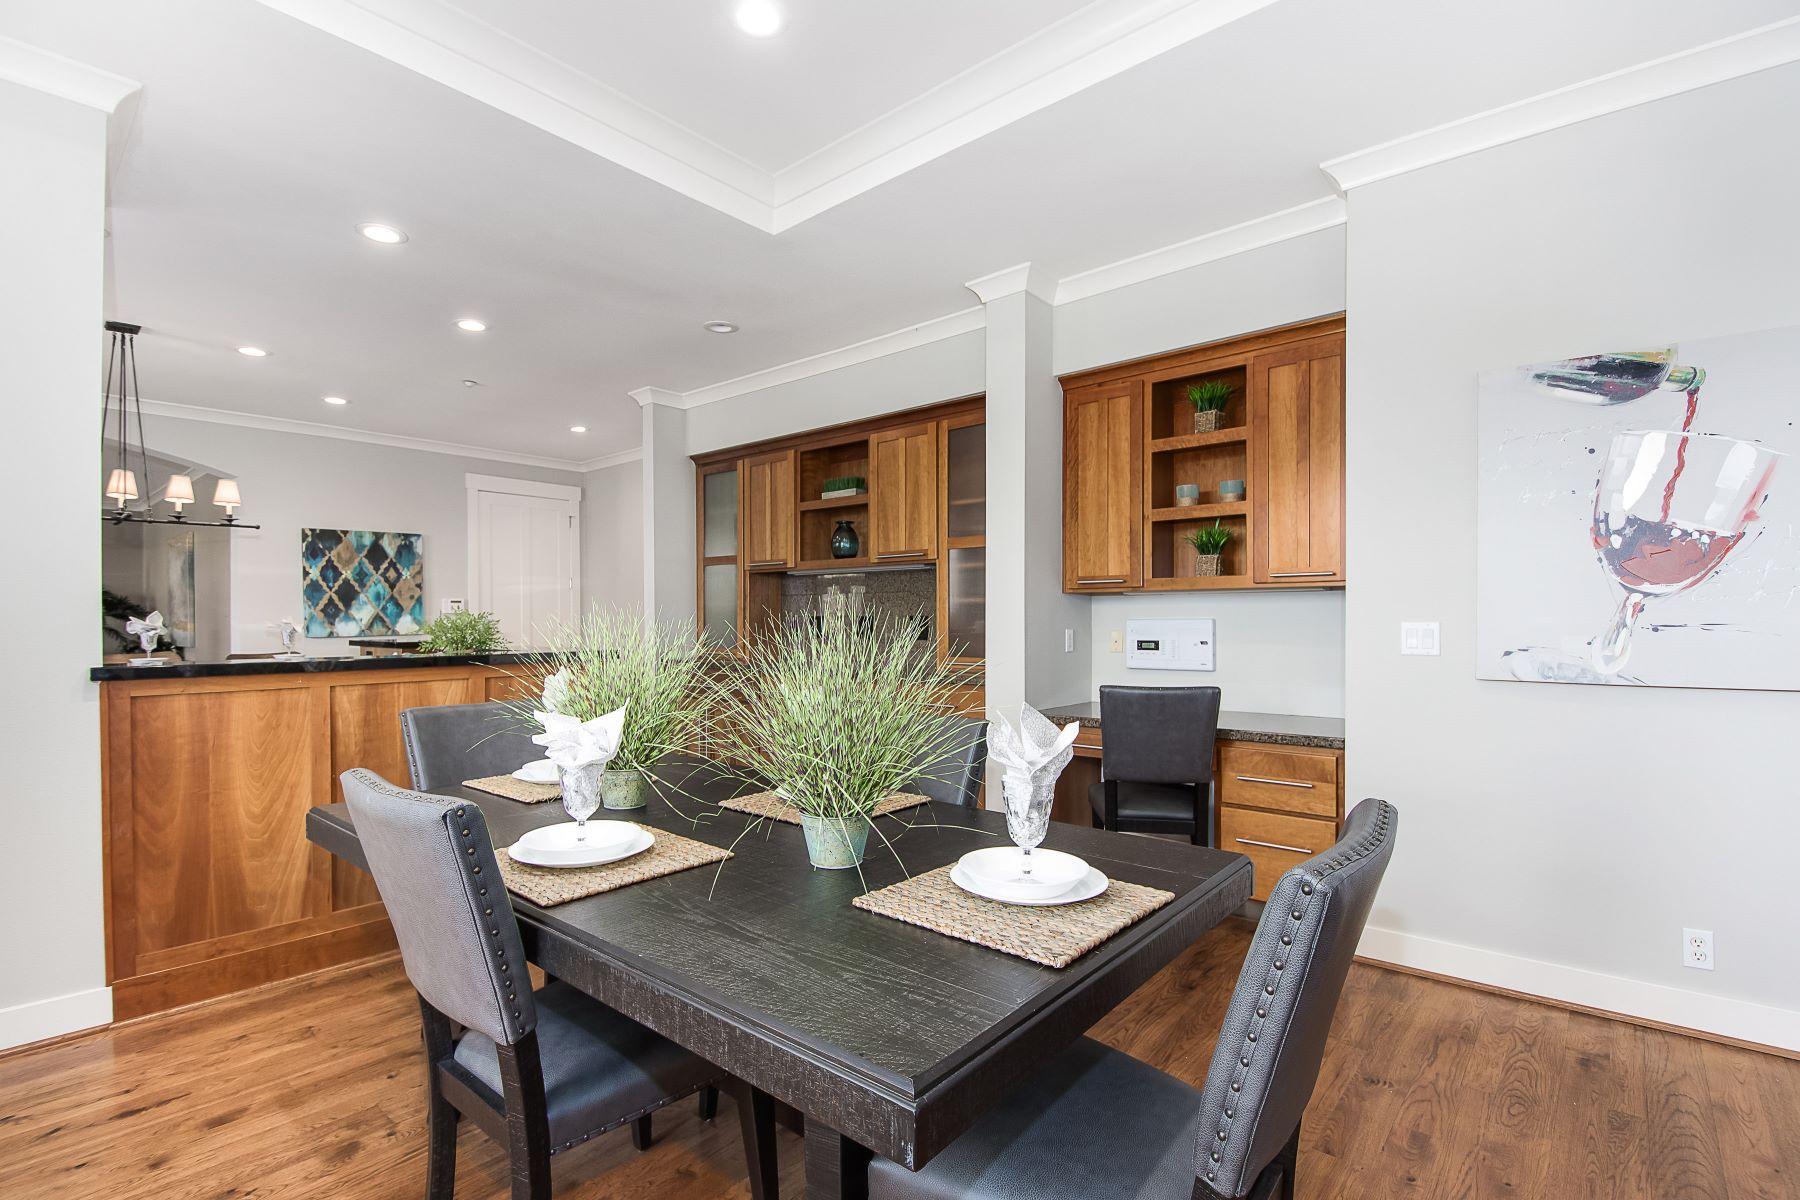 Additional photo for property listing at 3720 Raboli Street, Ruby Hill 3720 Raboli Street Pleasanton, California 94566 United States